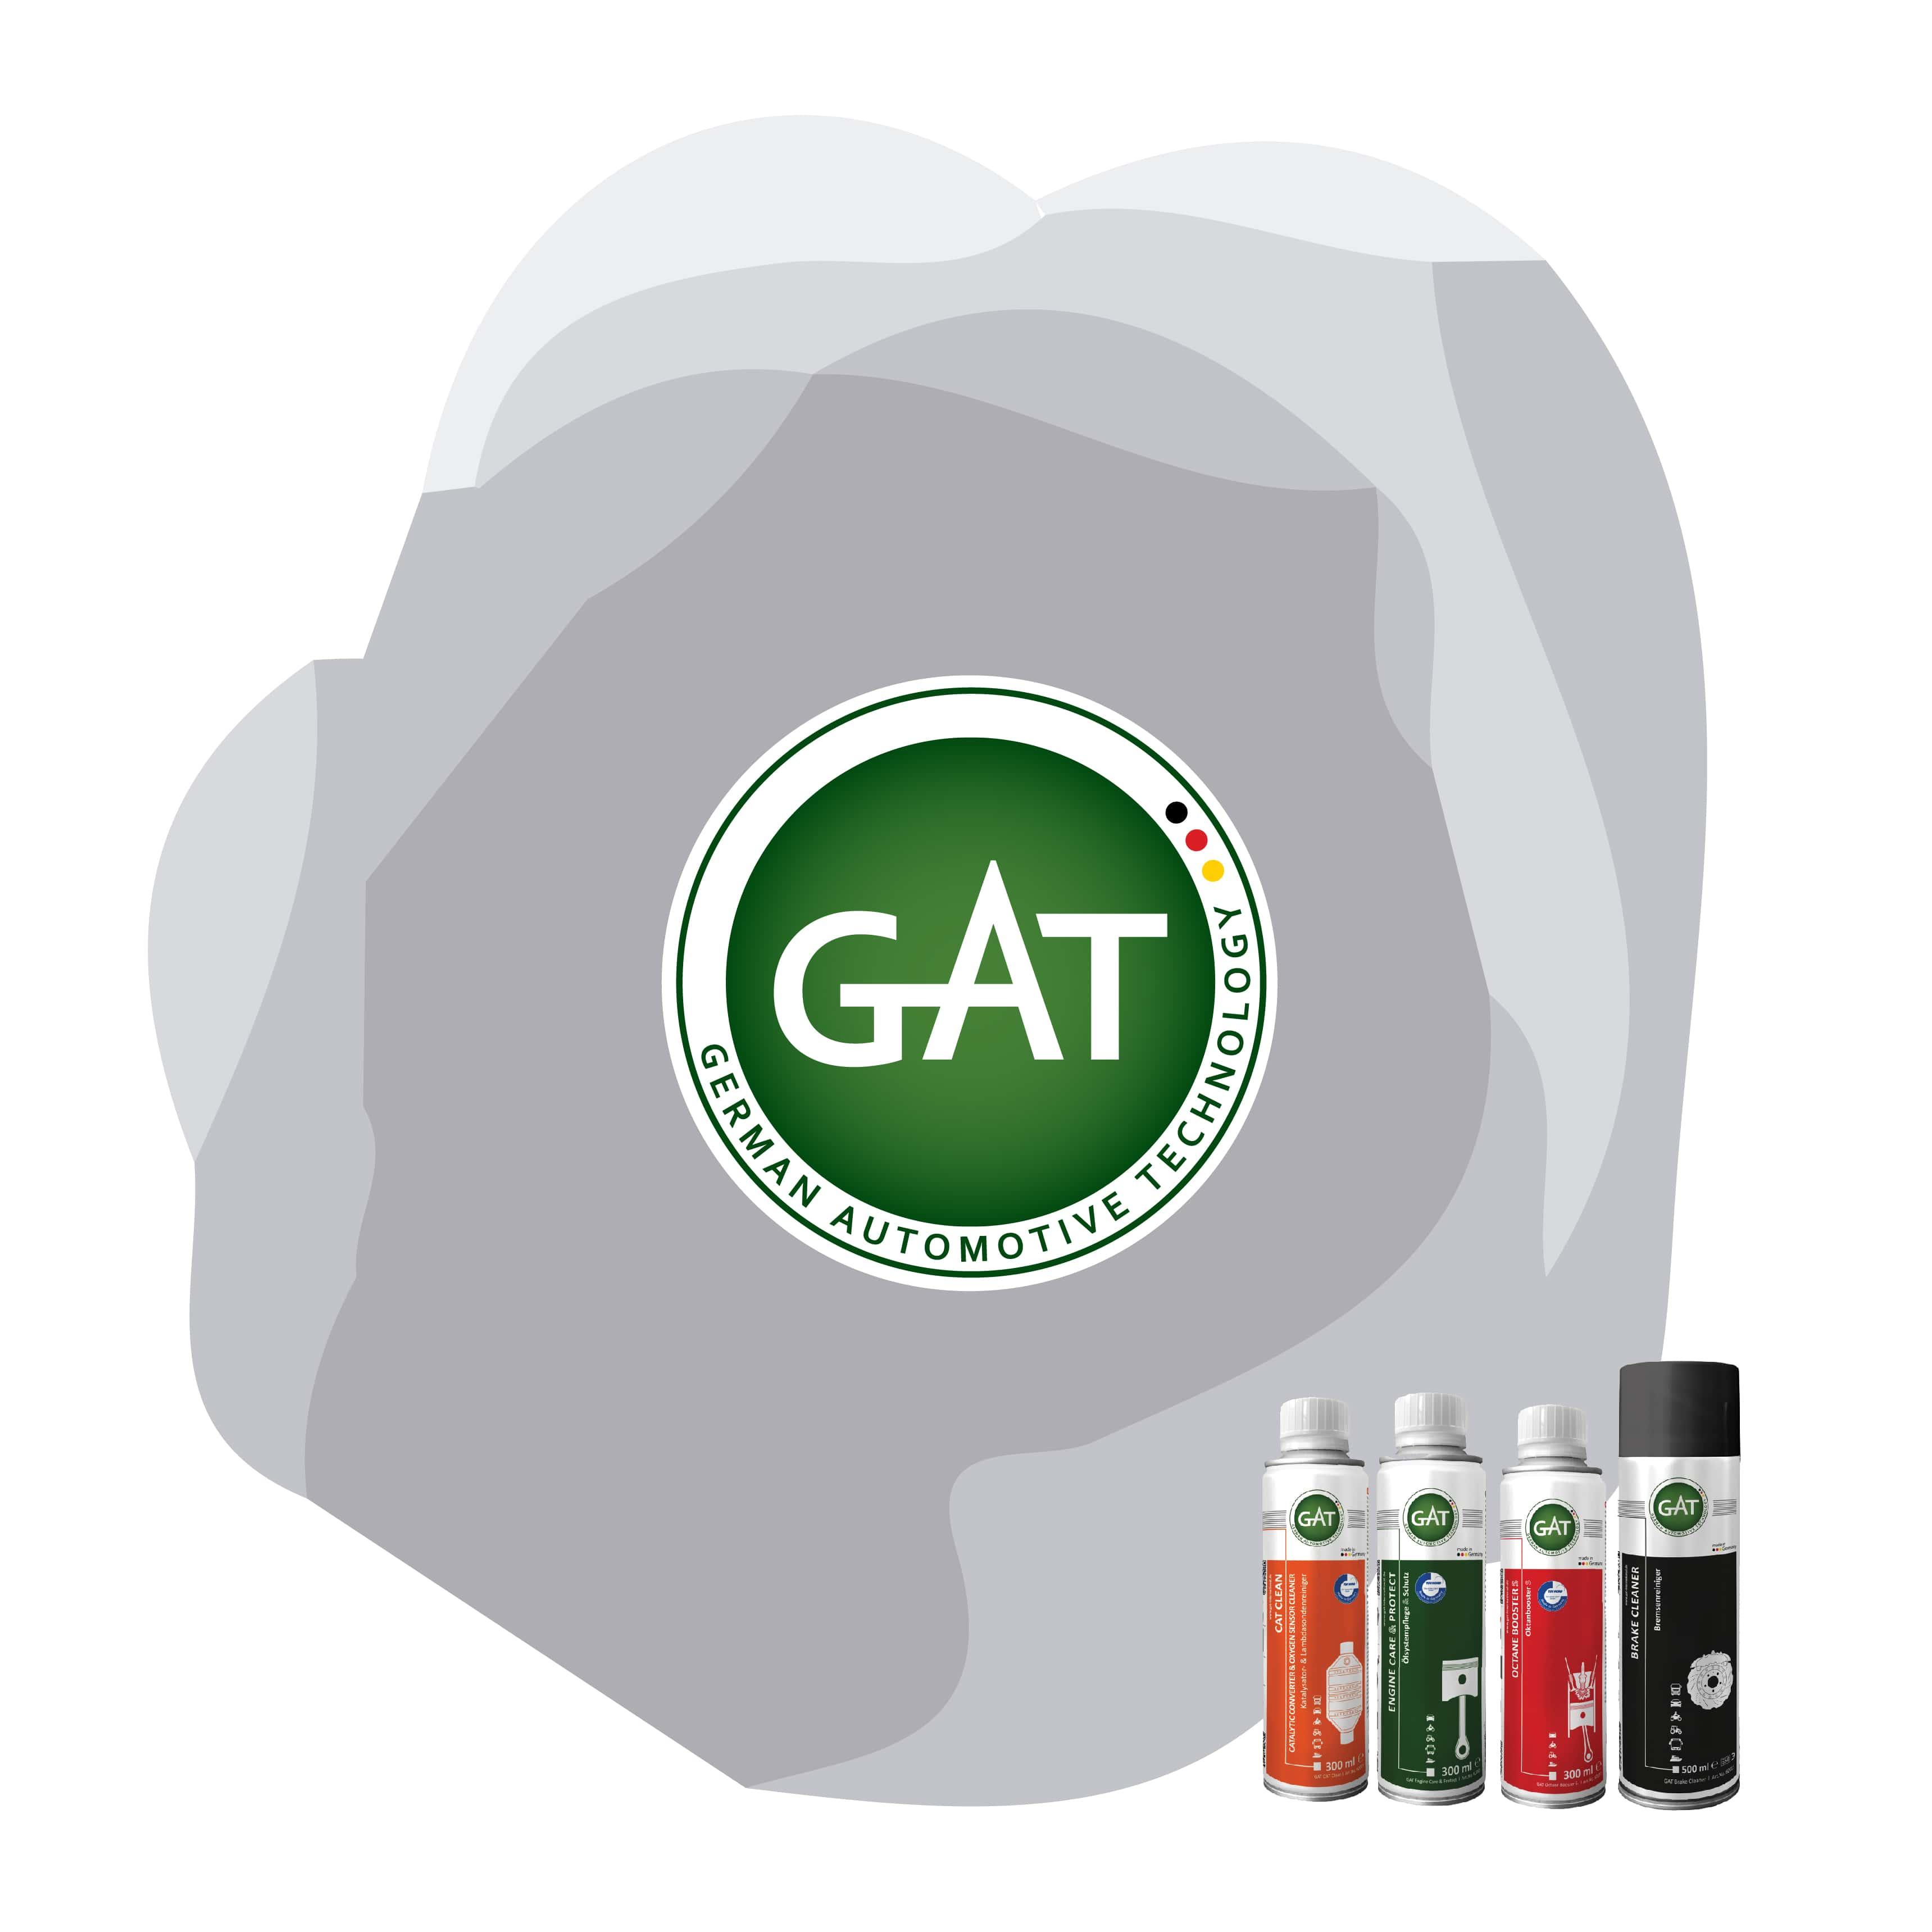 محصولات خودرویی GAT